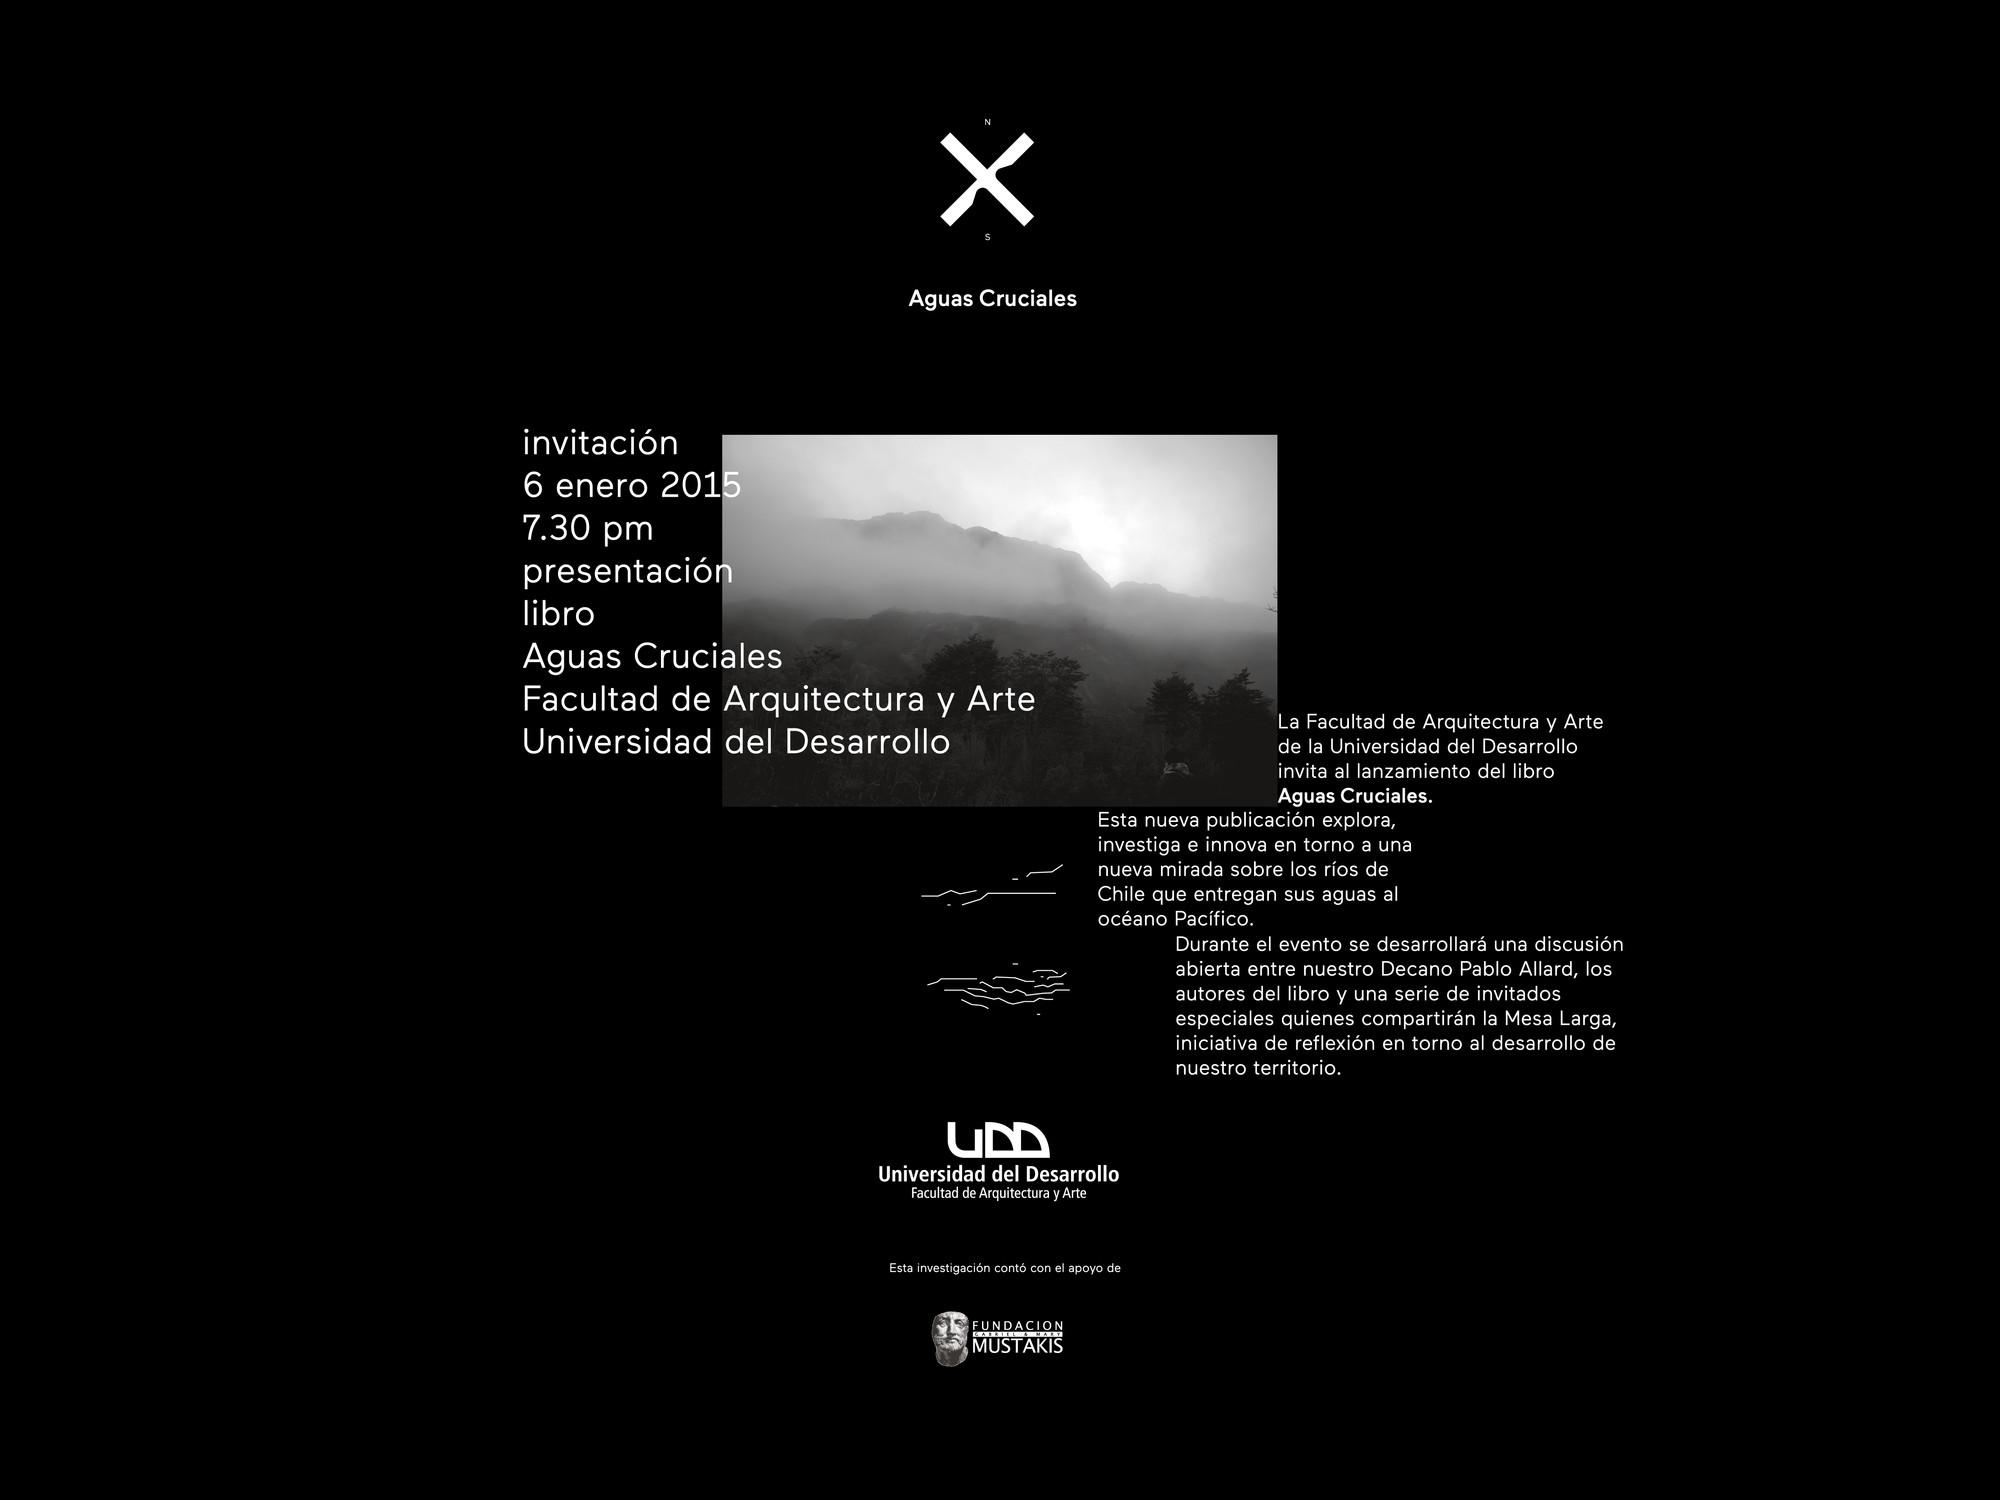 Presentación libro 'Aguas Cruciales' / Santiago, Chile